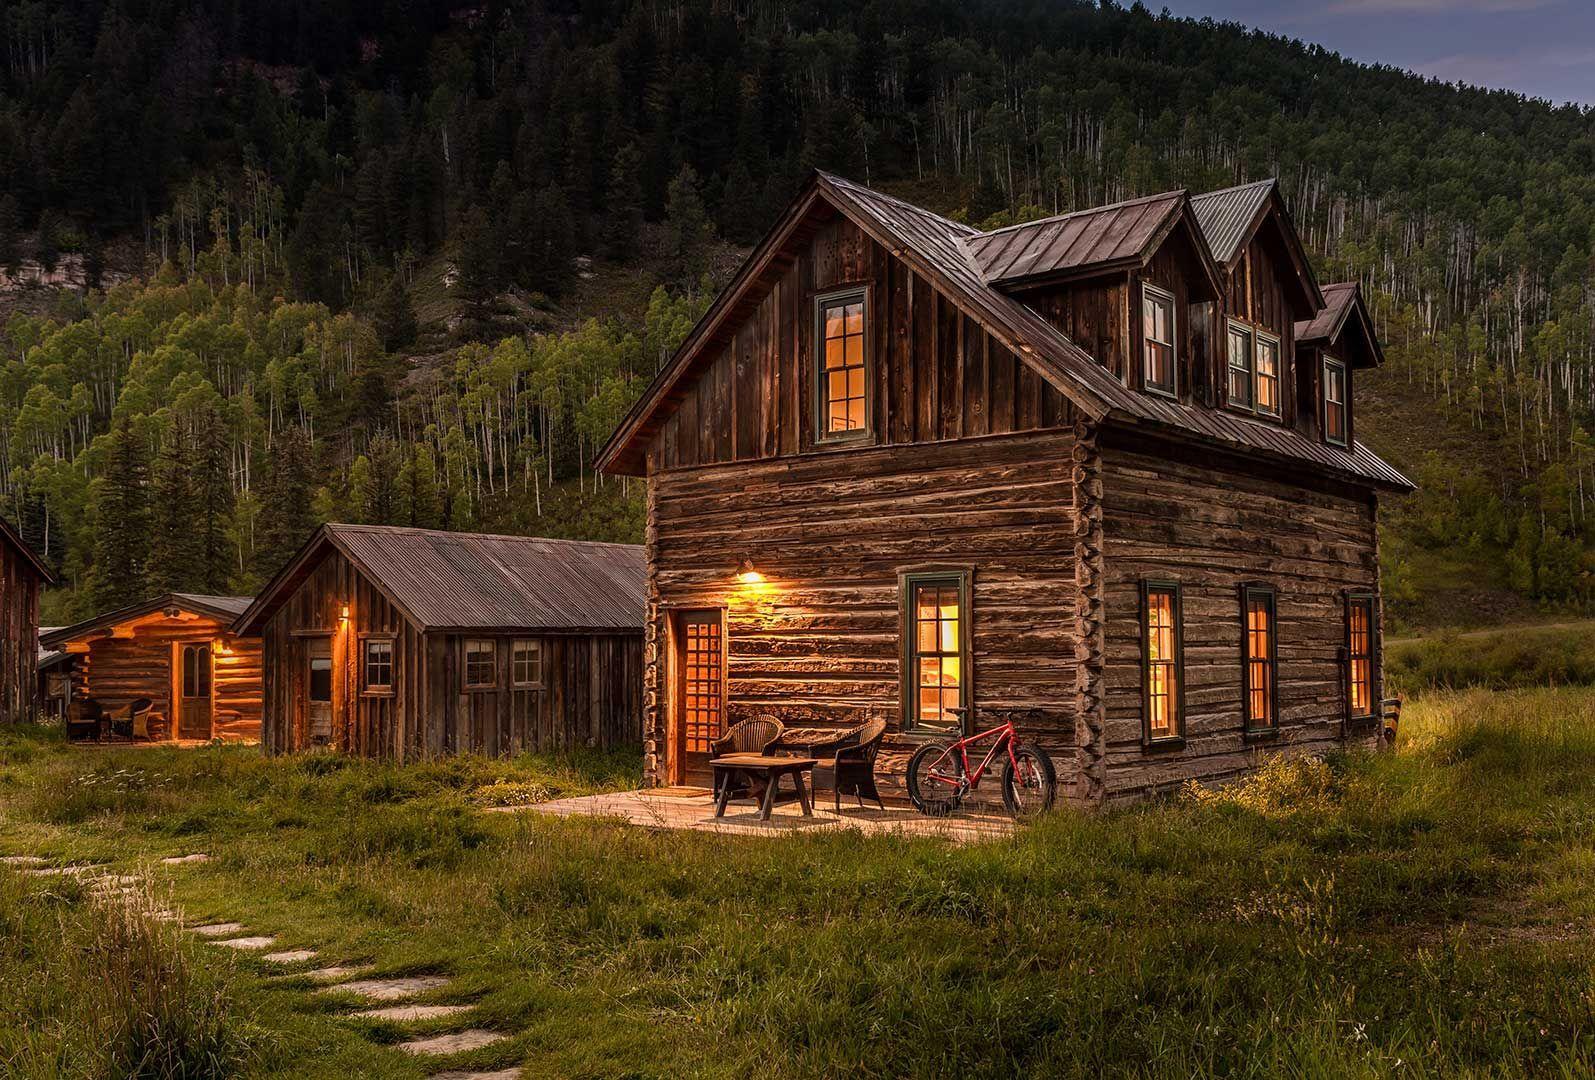 Tipping Log Cabin Cabins, cottages, Log homes, Cabin homes